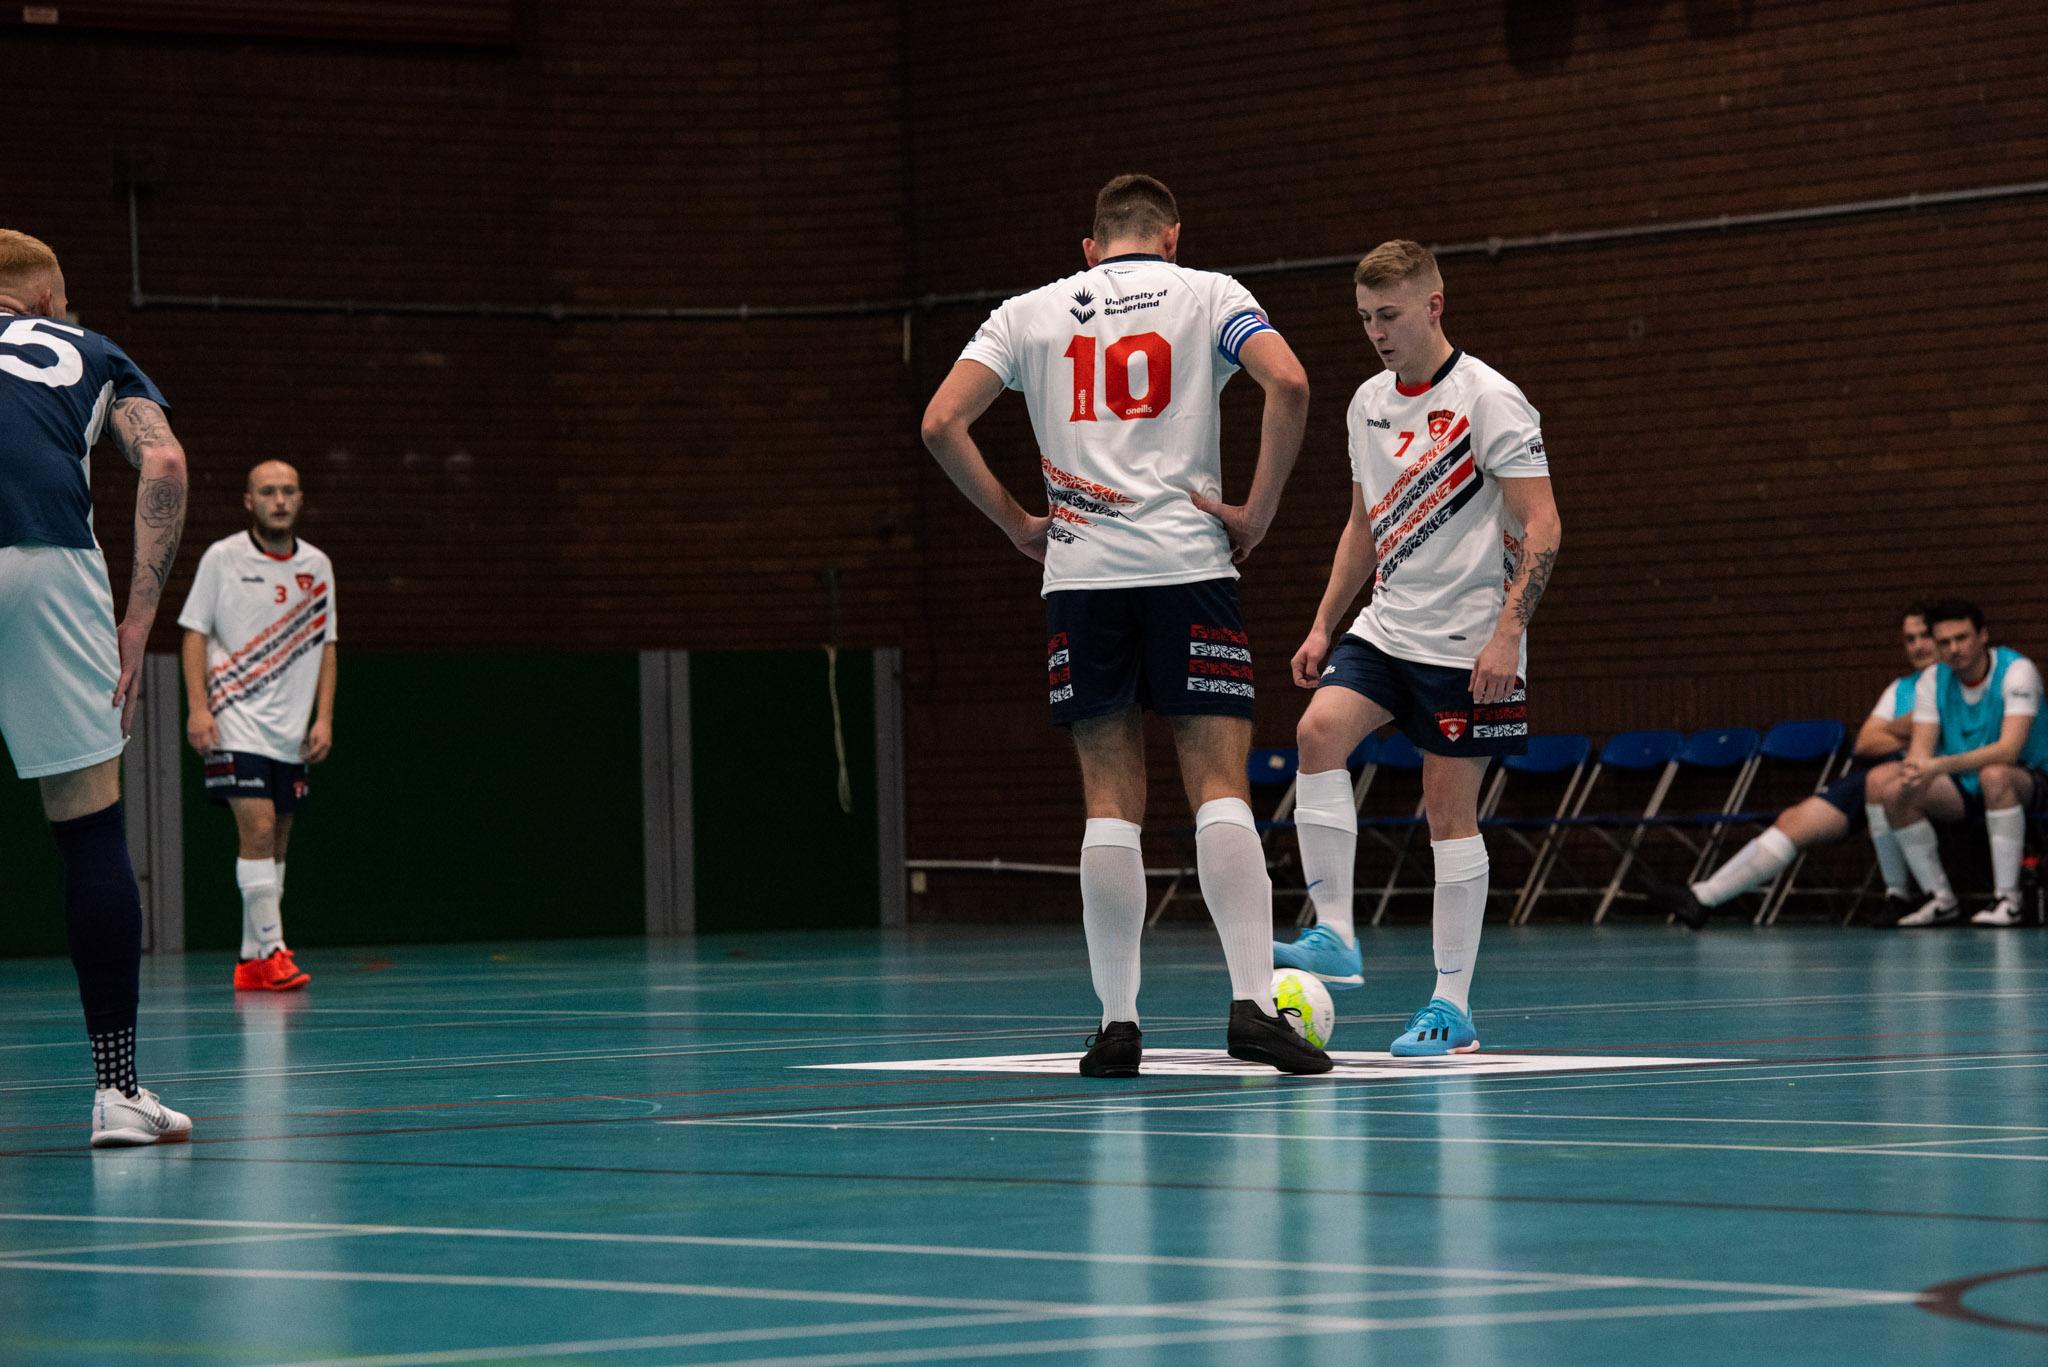 National League Futsal